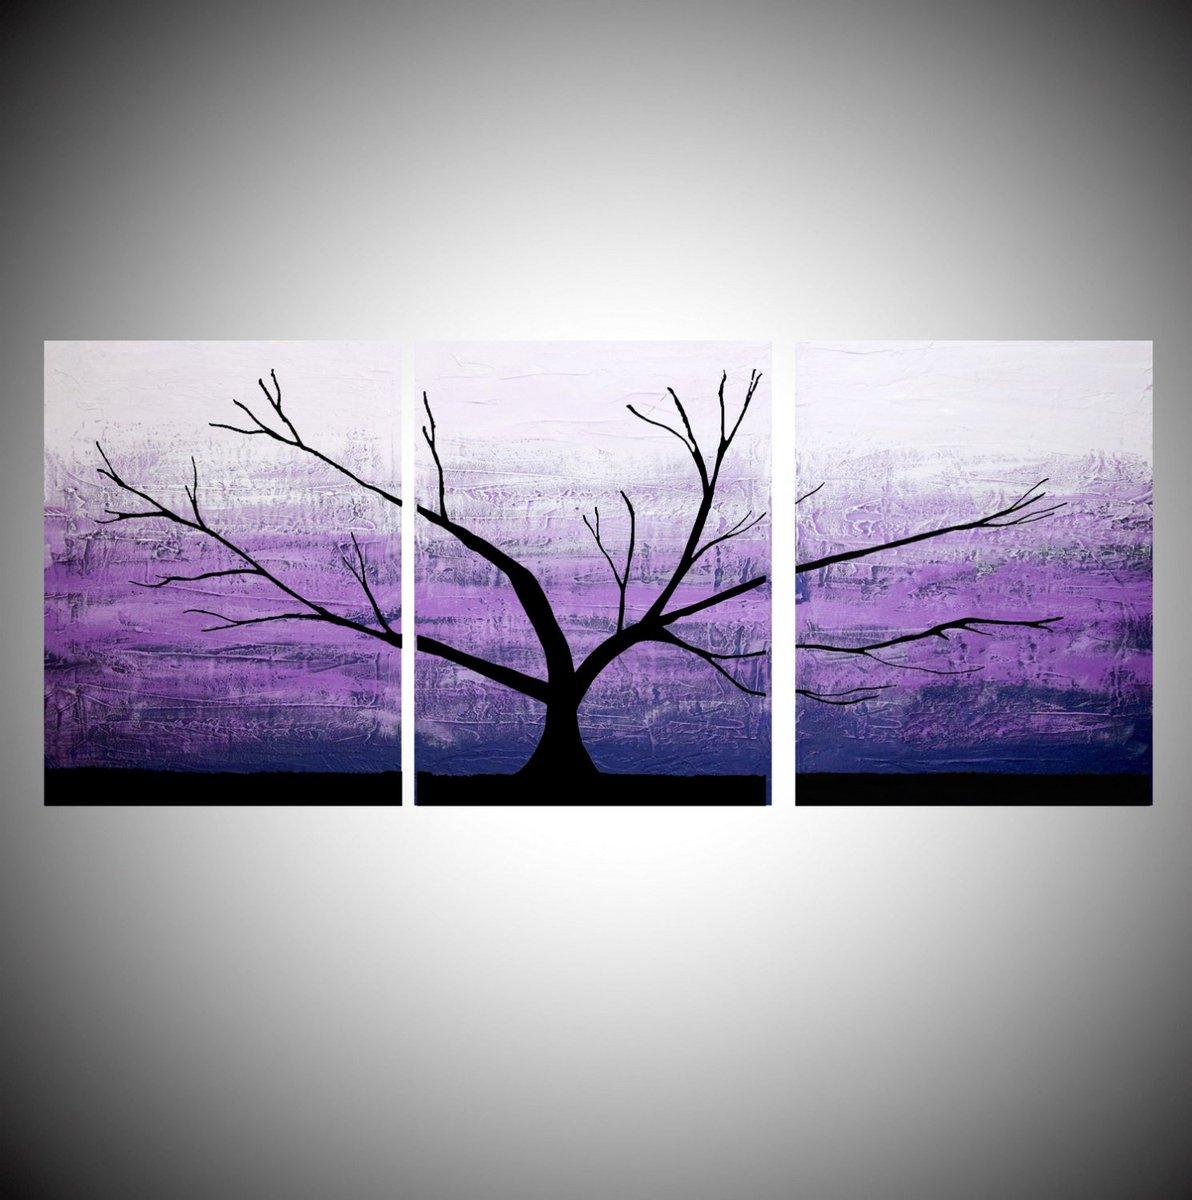 AFFORDABLE WALL ART triptych 3 panel wall contemporary art Tree of…  http:// tuppu.net/fe9ba24c  &nbsp;   #canvas #ContemporaryArt<br>http://pic.twitter.com/6cUys4nPFc